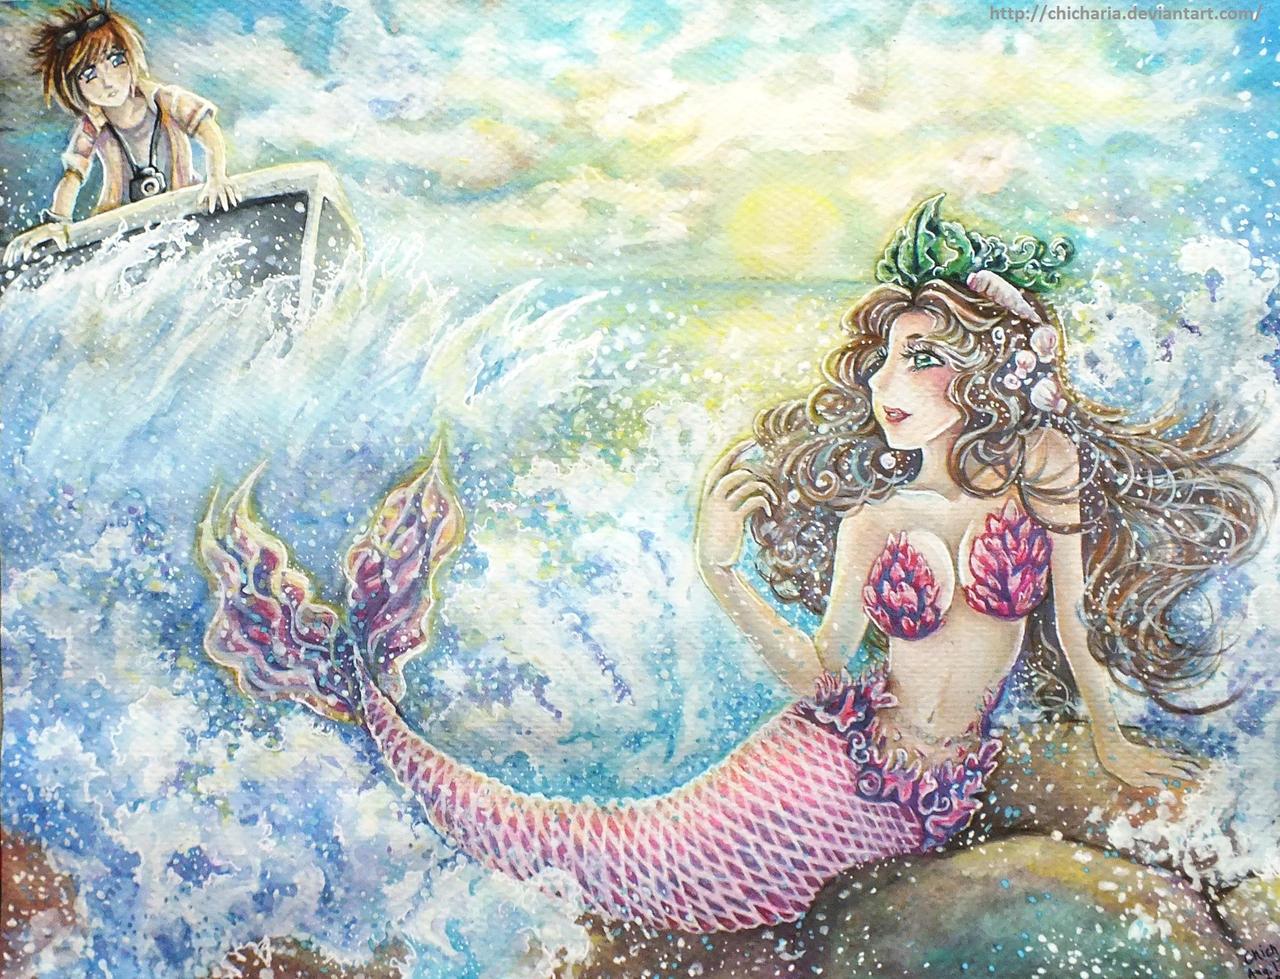 Mermaid Lure by chicharrria